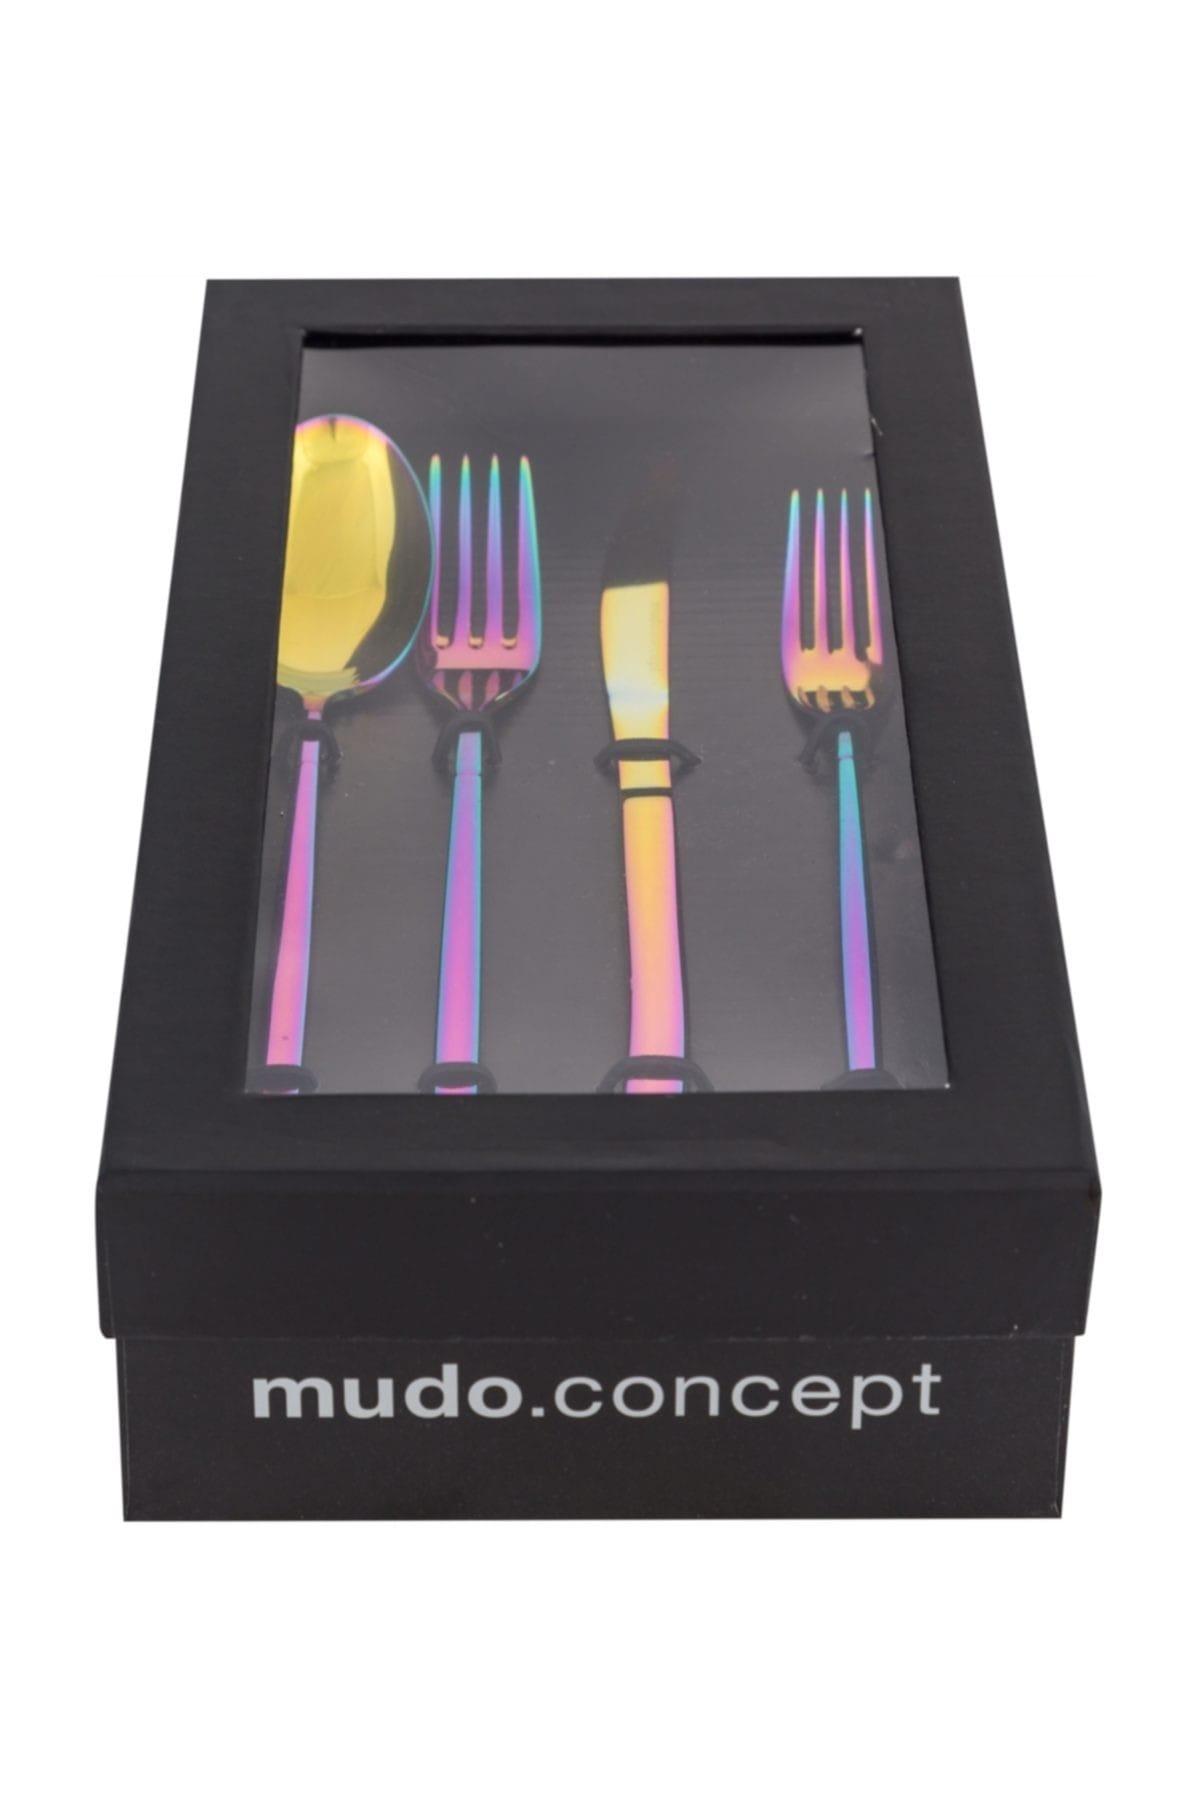 Mudo Concept Grace Çatal Kaşık Bıçak 24 Parça- Colorful 2